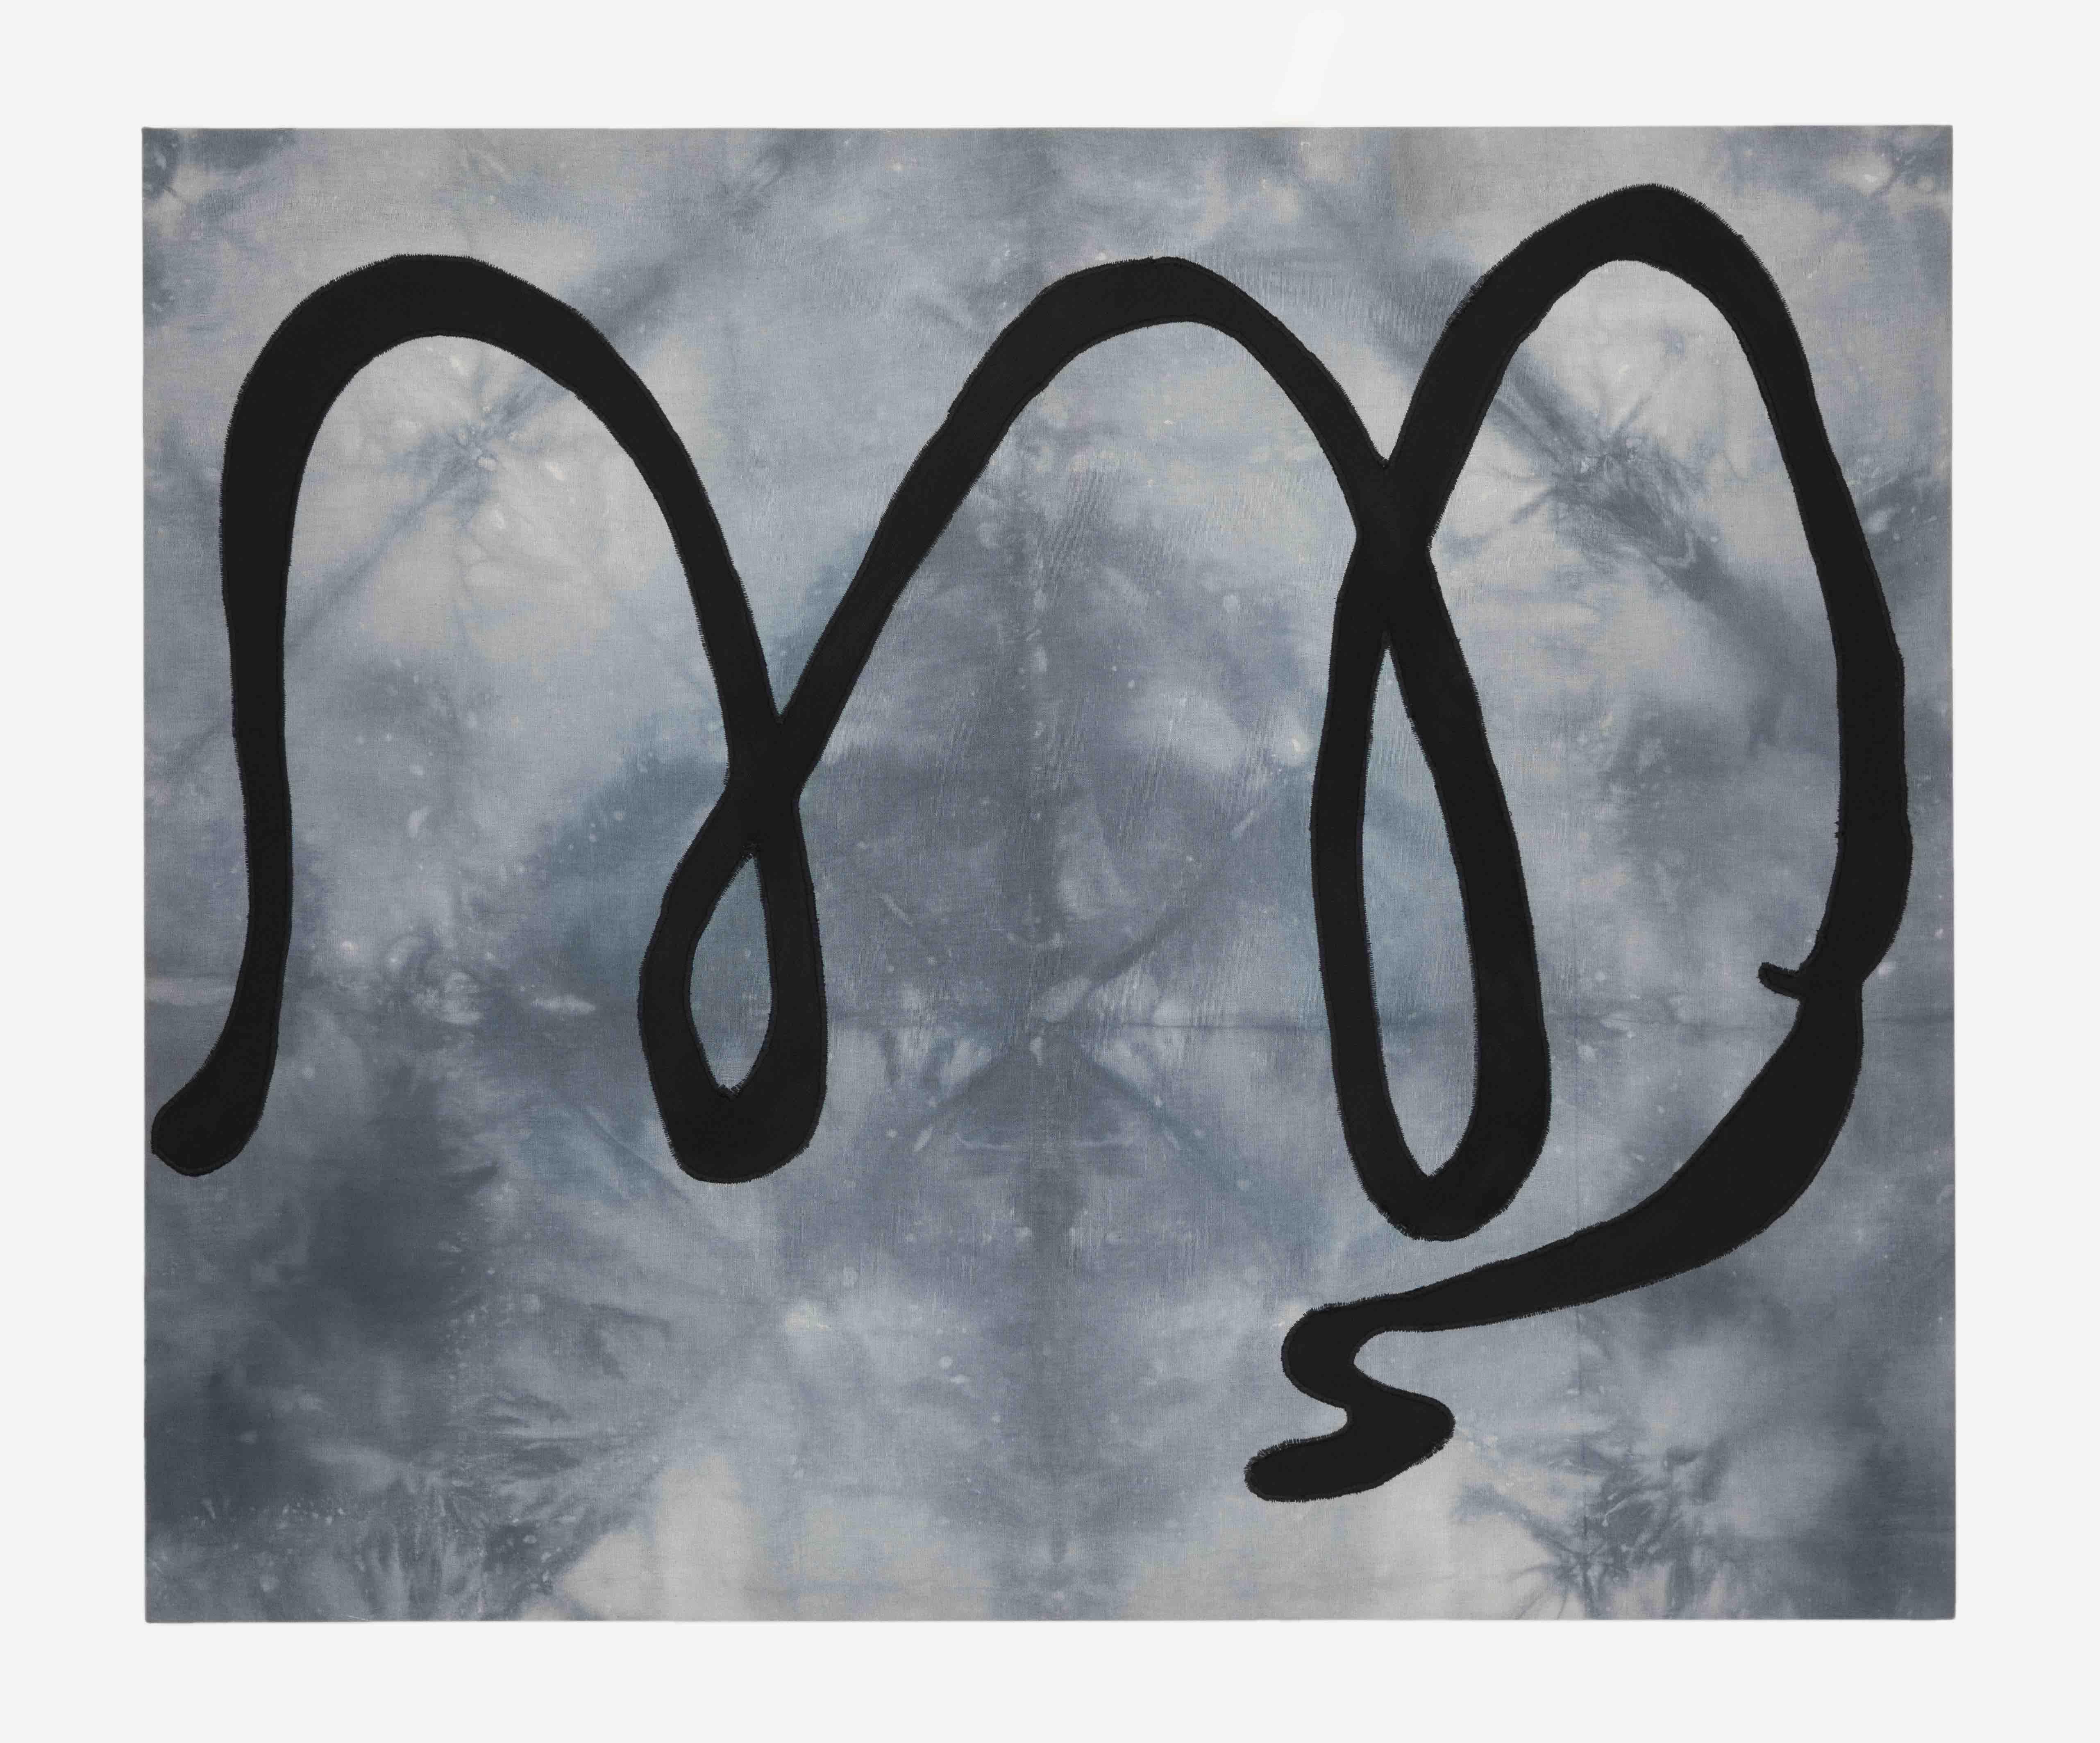 Milagros Rojas. Untitled (2021) Dyed and embroidered cotton fabric, gabardine. 104 x 86 x 4 cm. Photo: Jordán Rodríguez. Courtesy of the artist and Salón Silicon